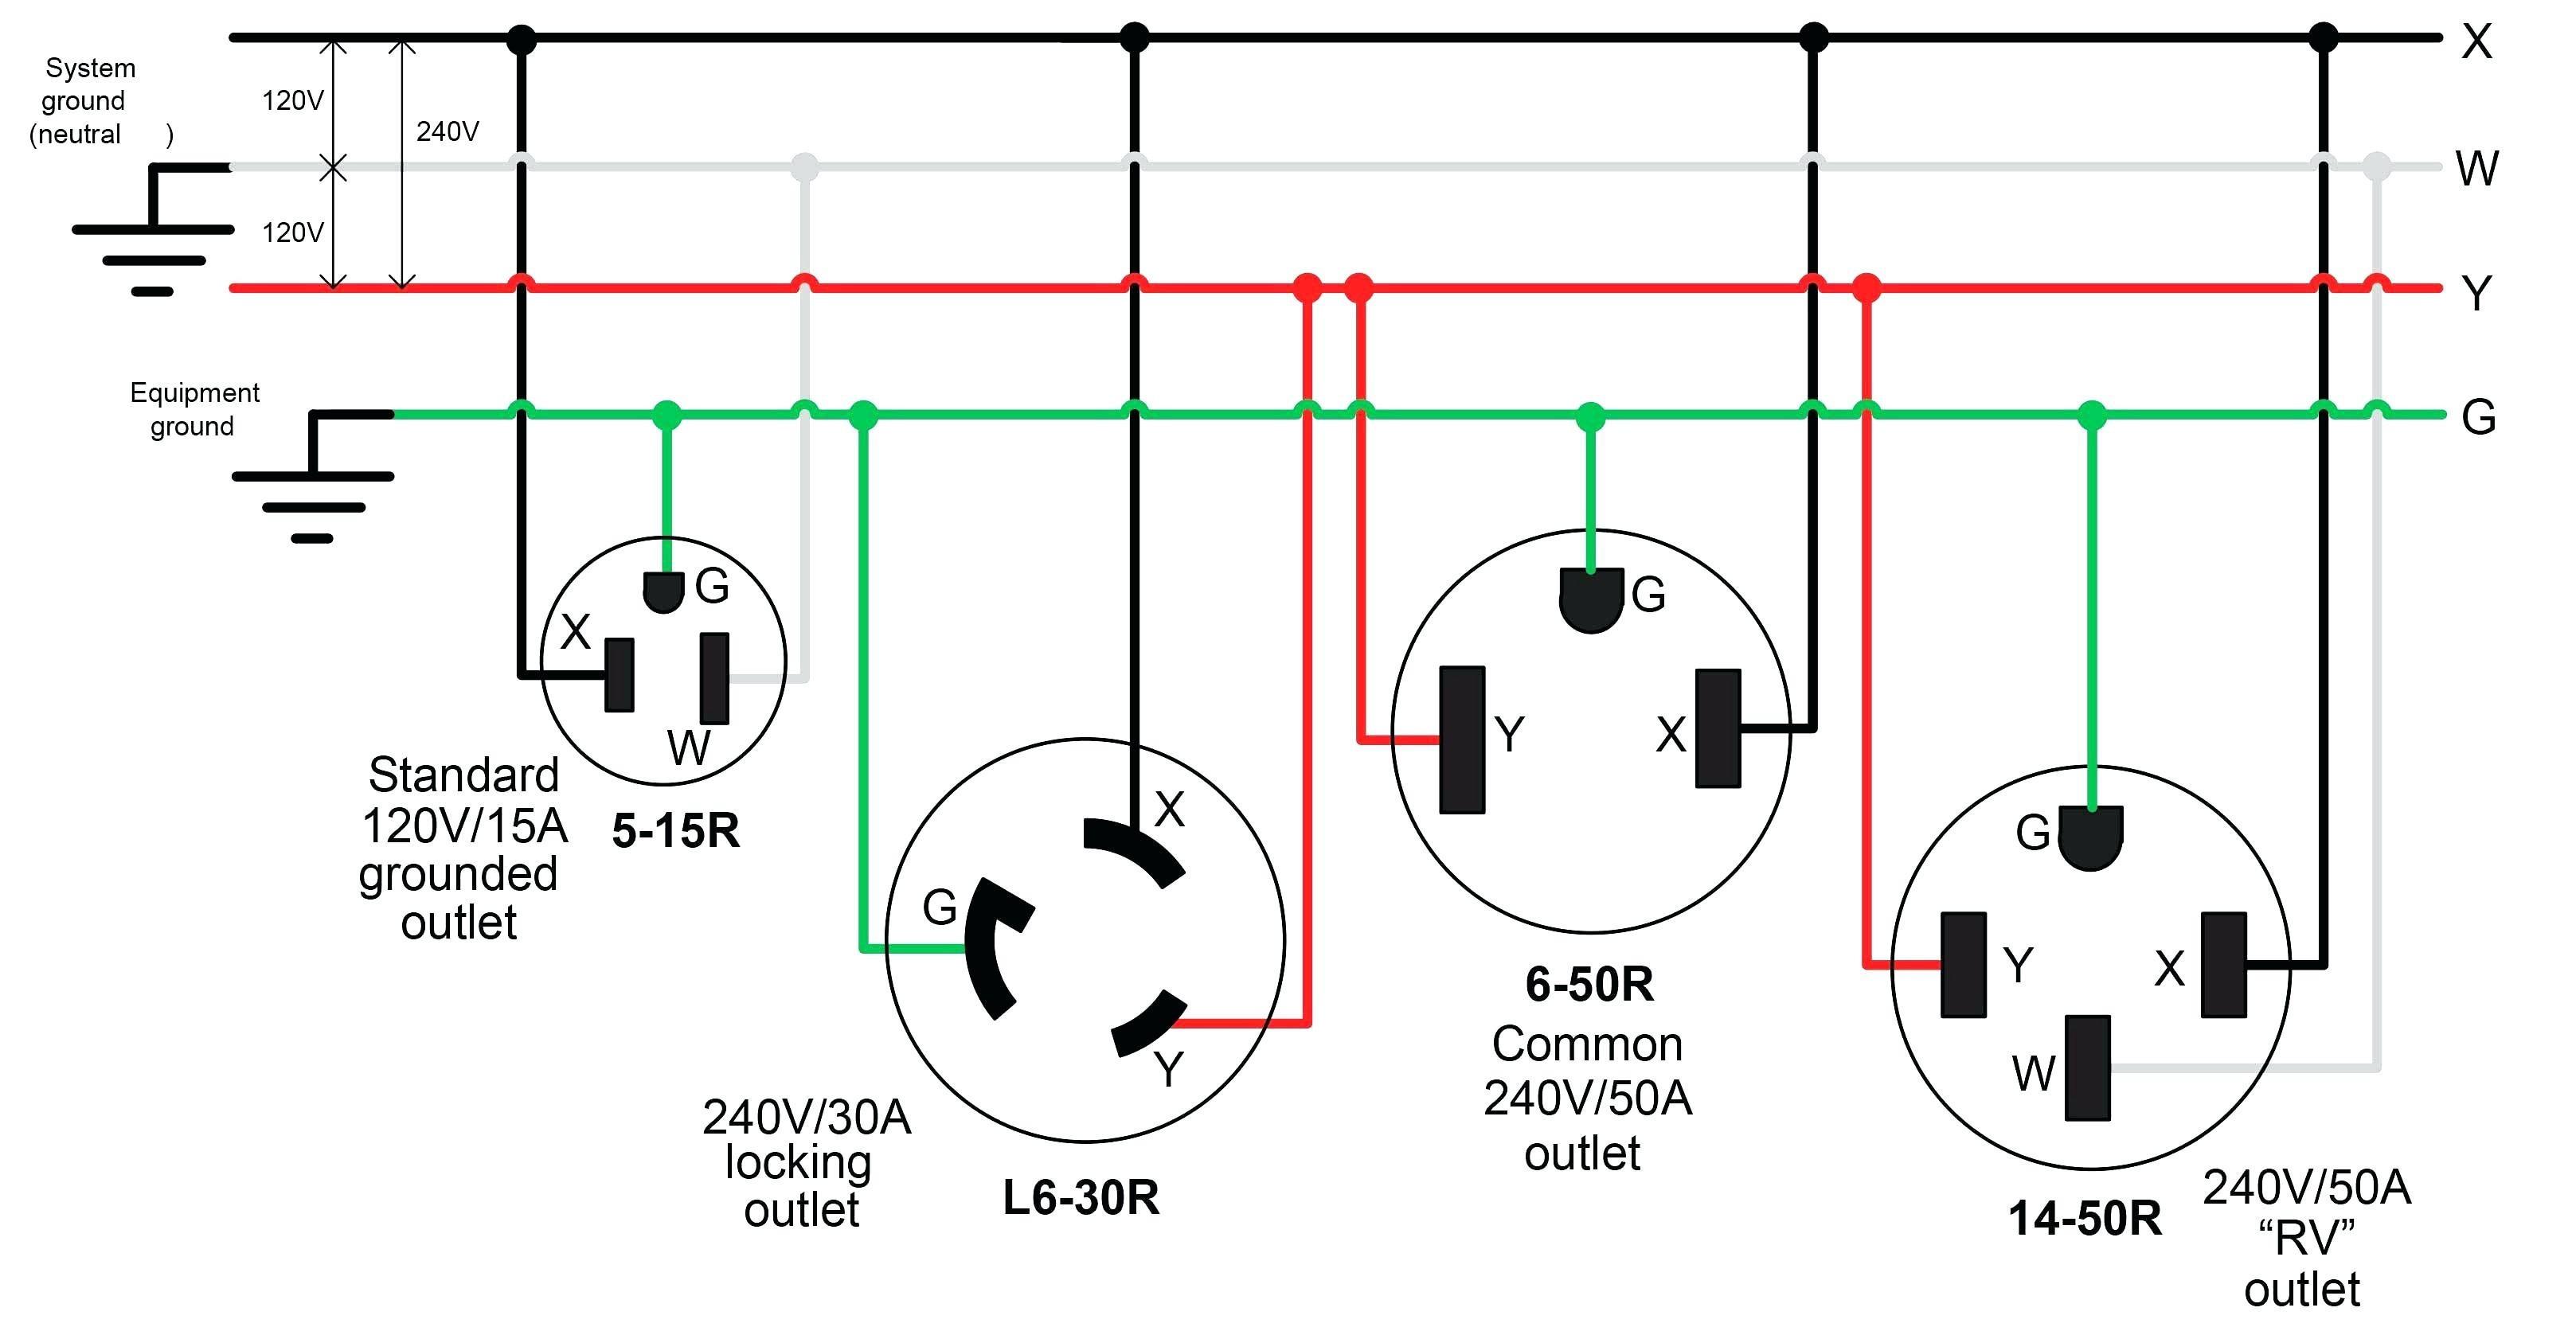 Nema Wiring Diagram Symbols : Nema r wiring diagram my